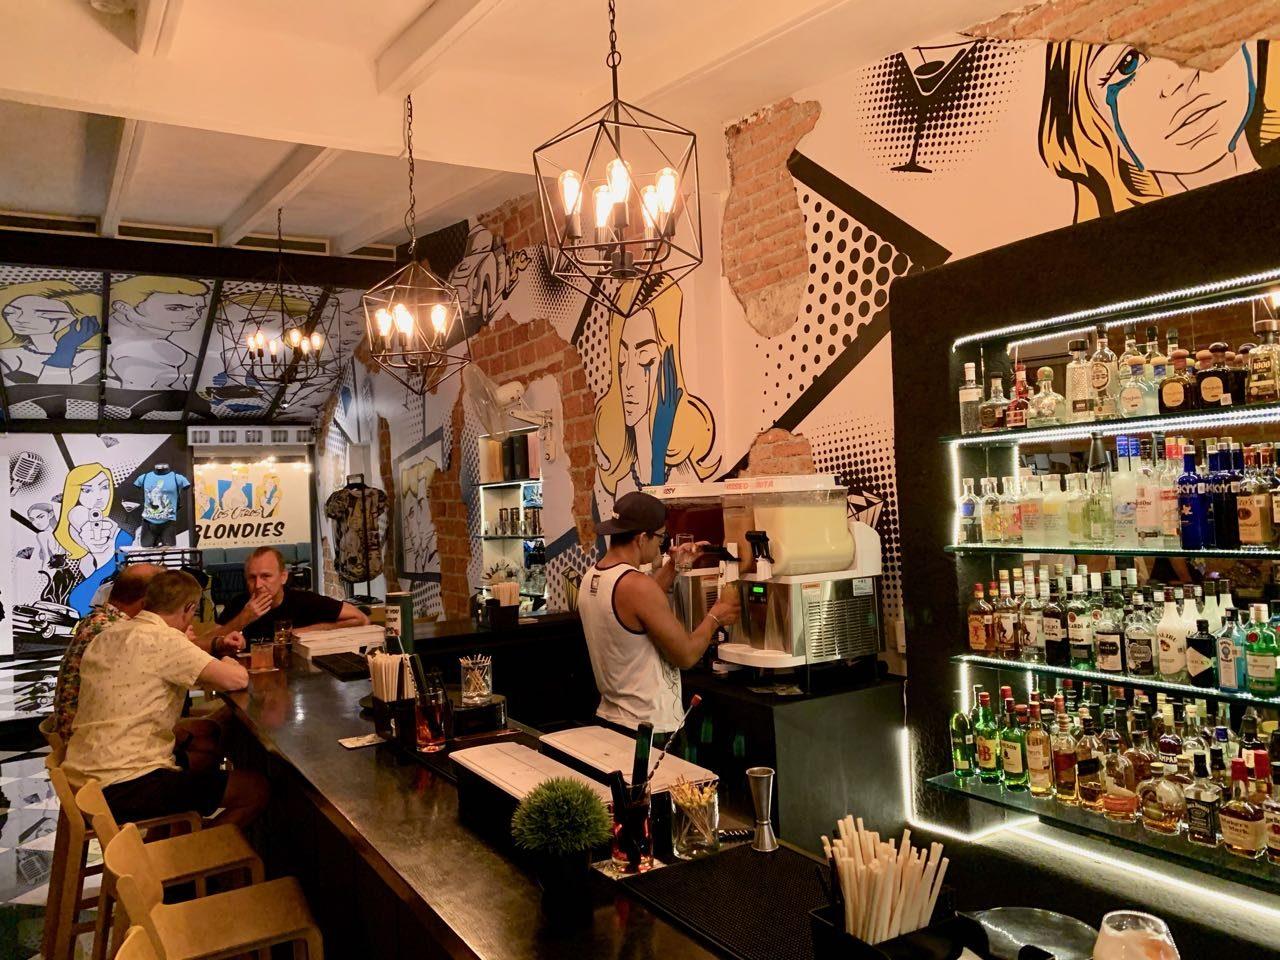 Gay Bars Puerto Vallarta: Blondies serves boozy slushies in a cartoon pop art interior.